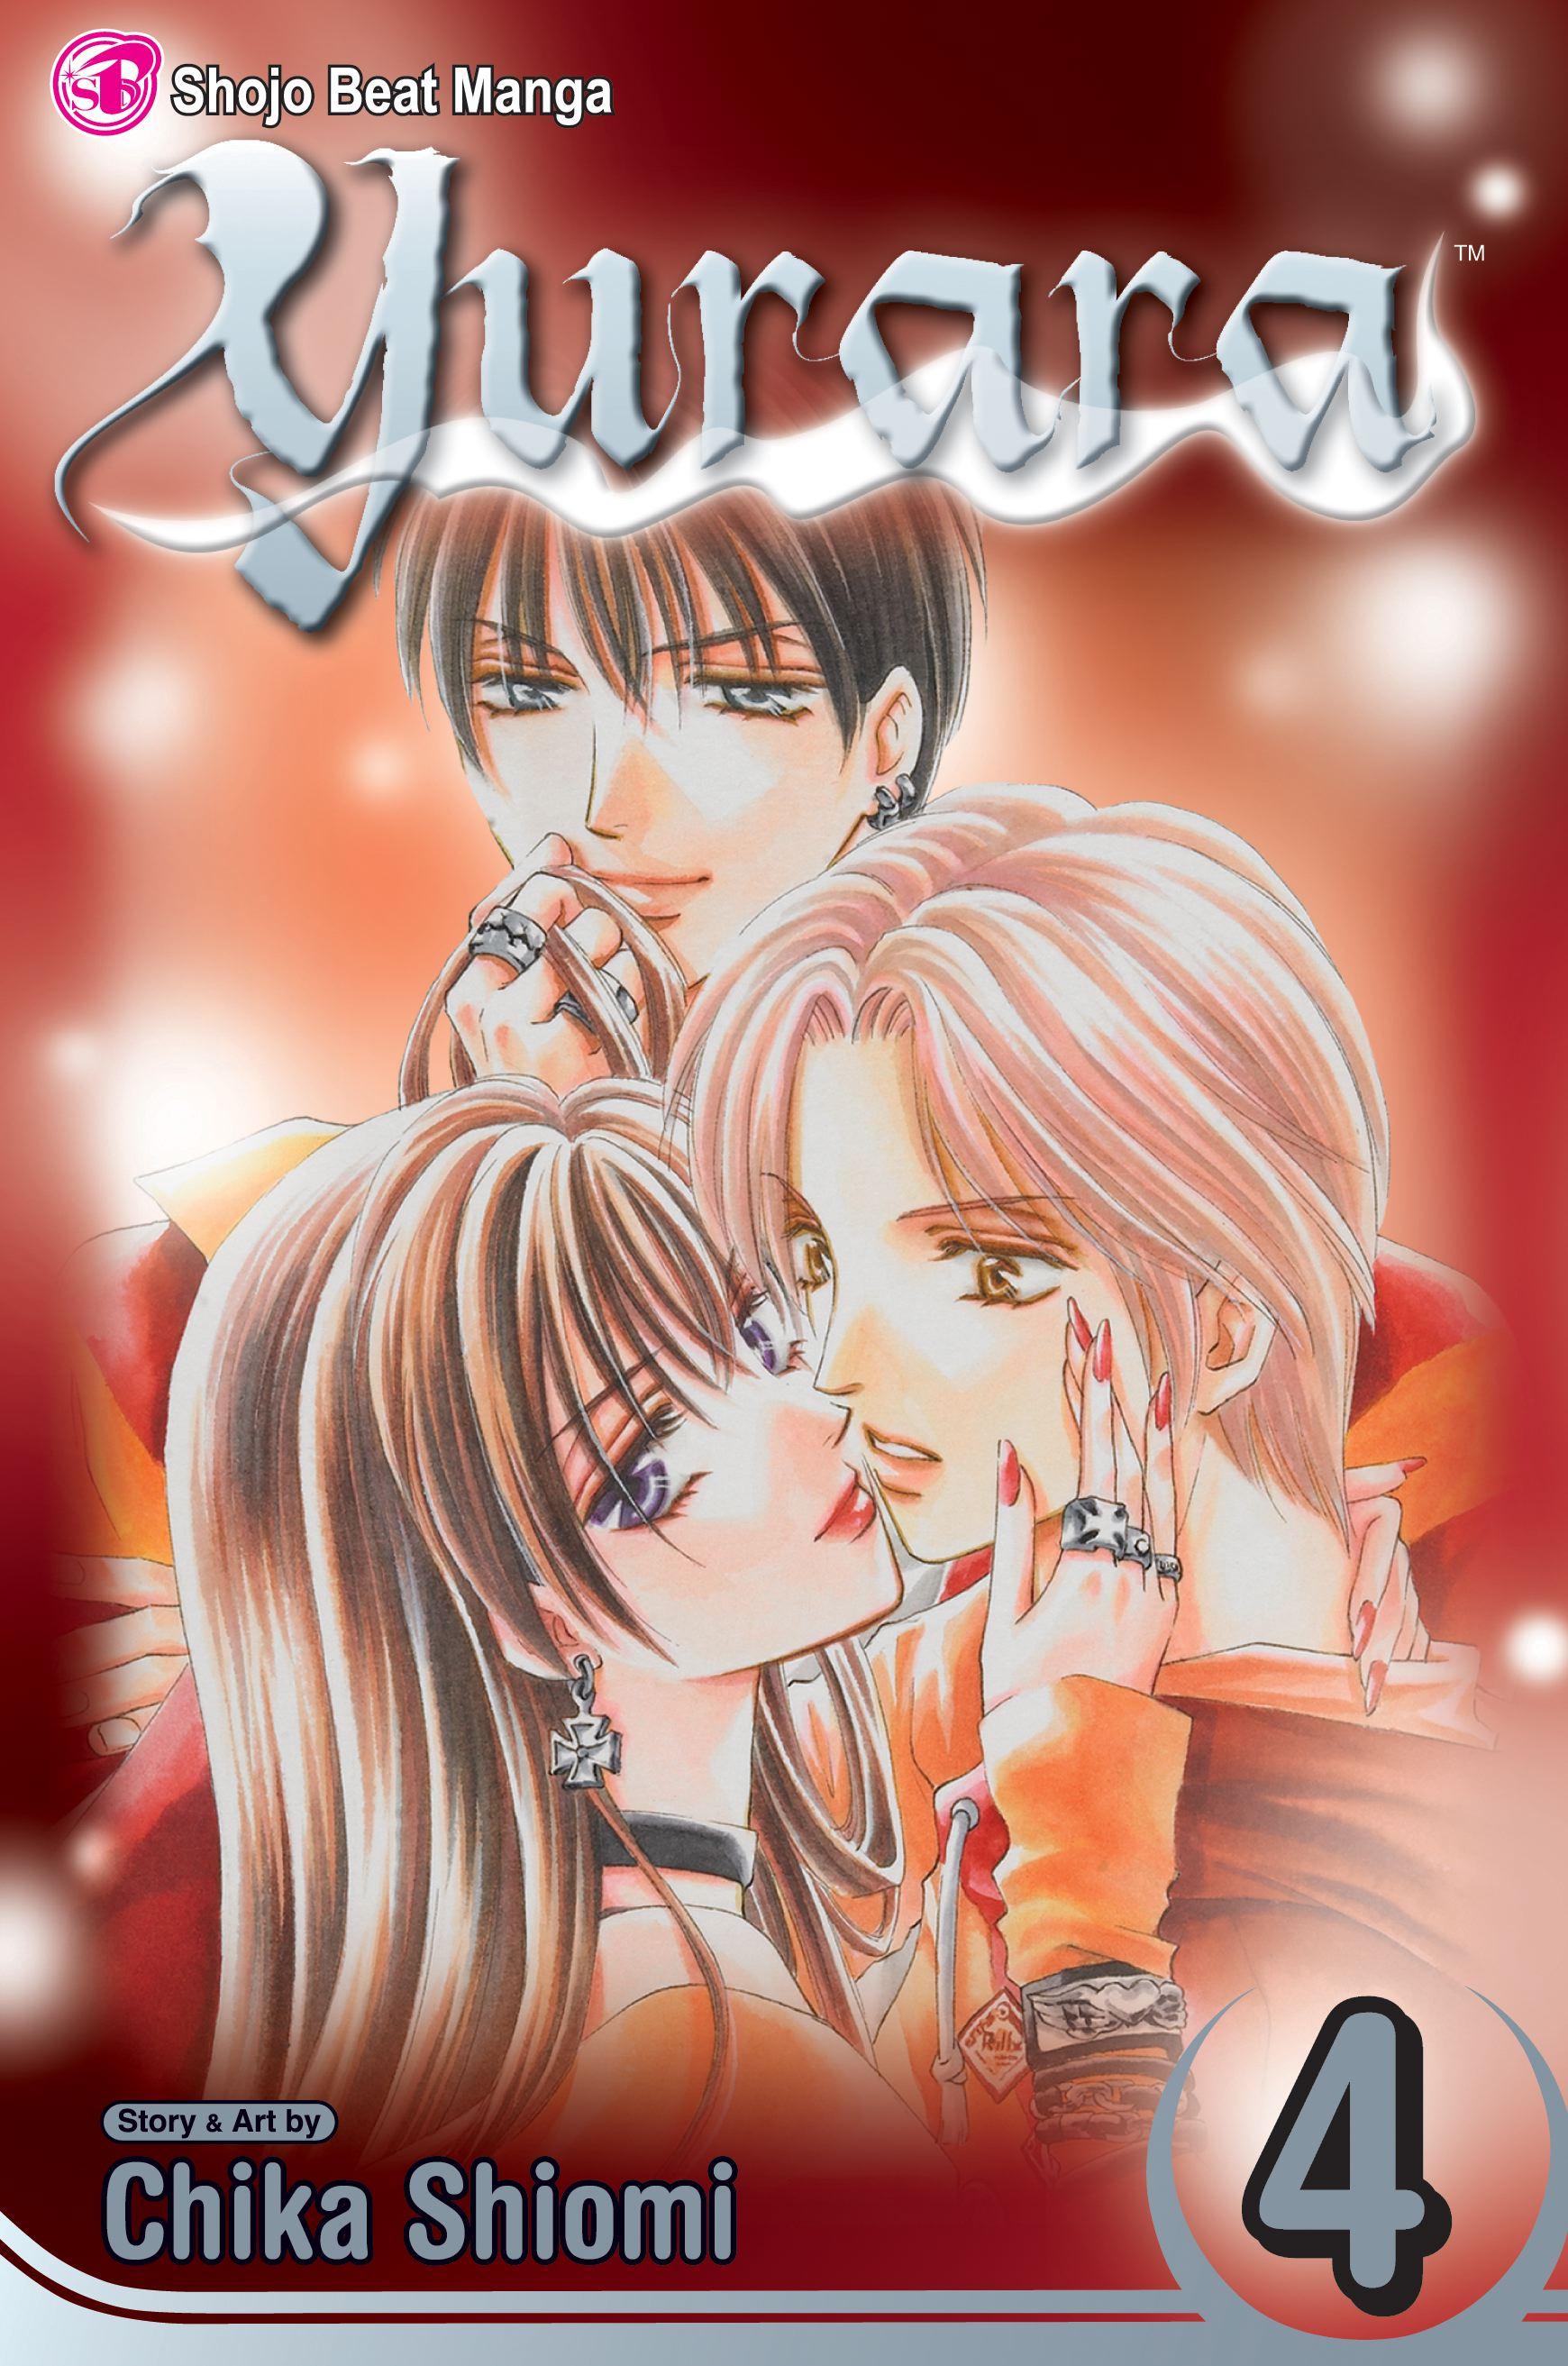 Yurara vol 4 9781421513539 hr